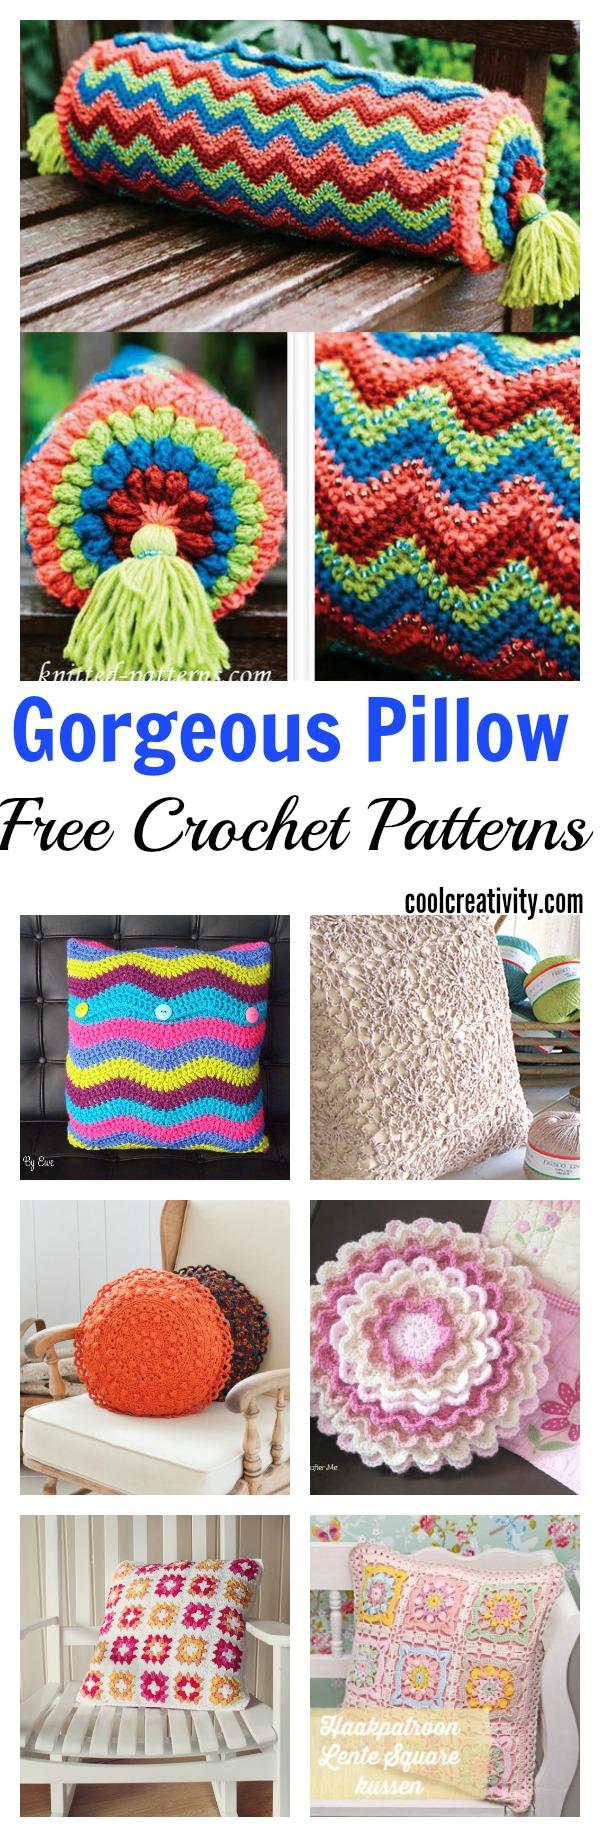 10 Free Gorgeous Pillow Crochet Patterns